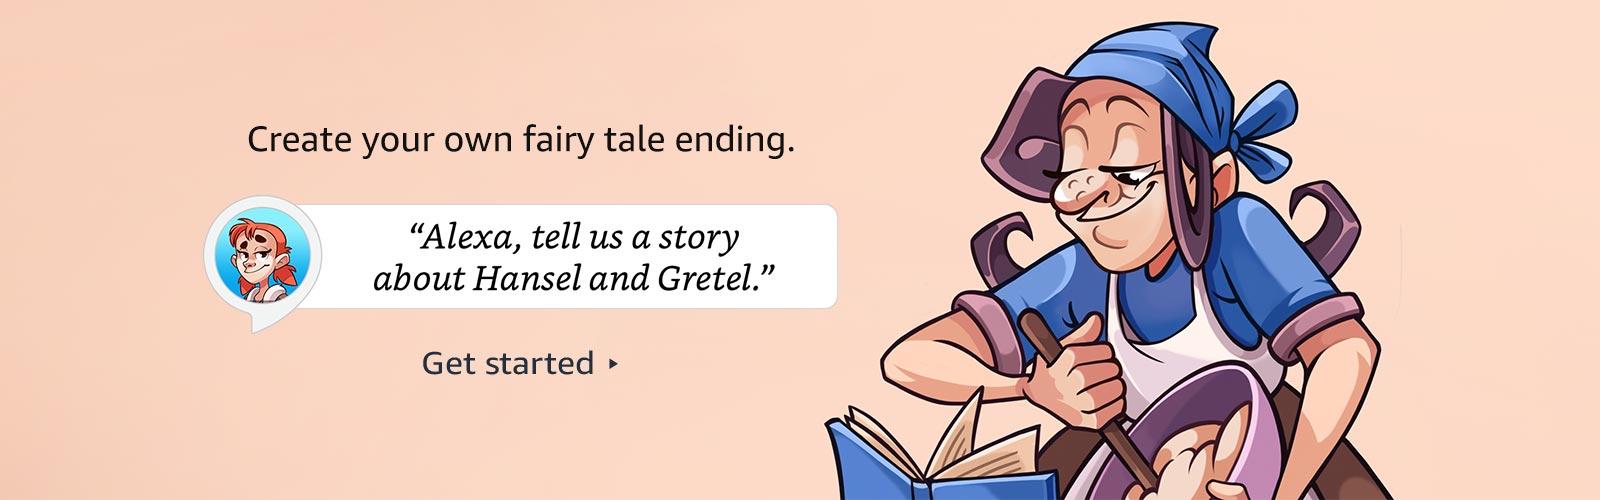 """Alexa, tell us a story about Hansel & Gretel"""